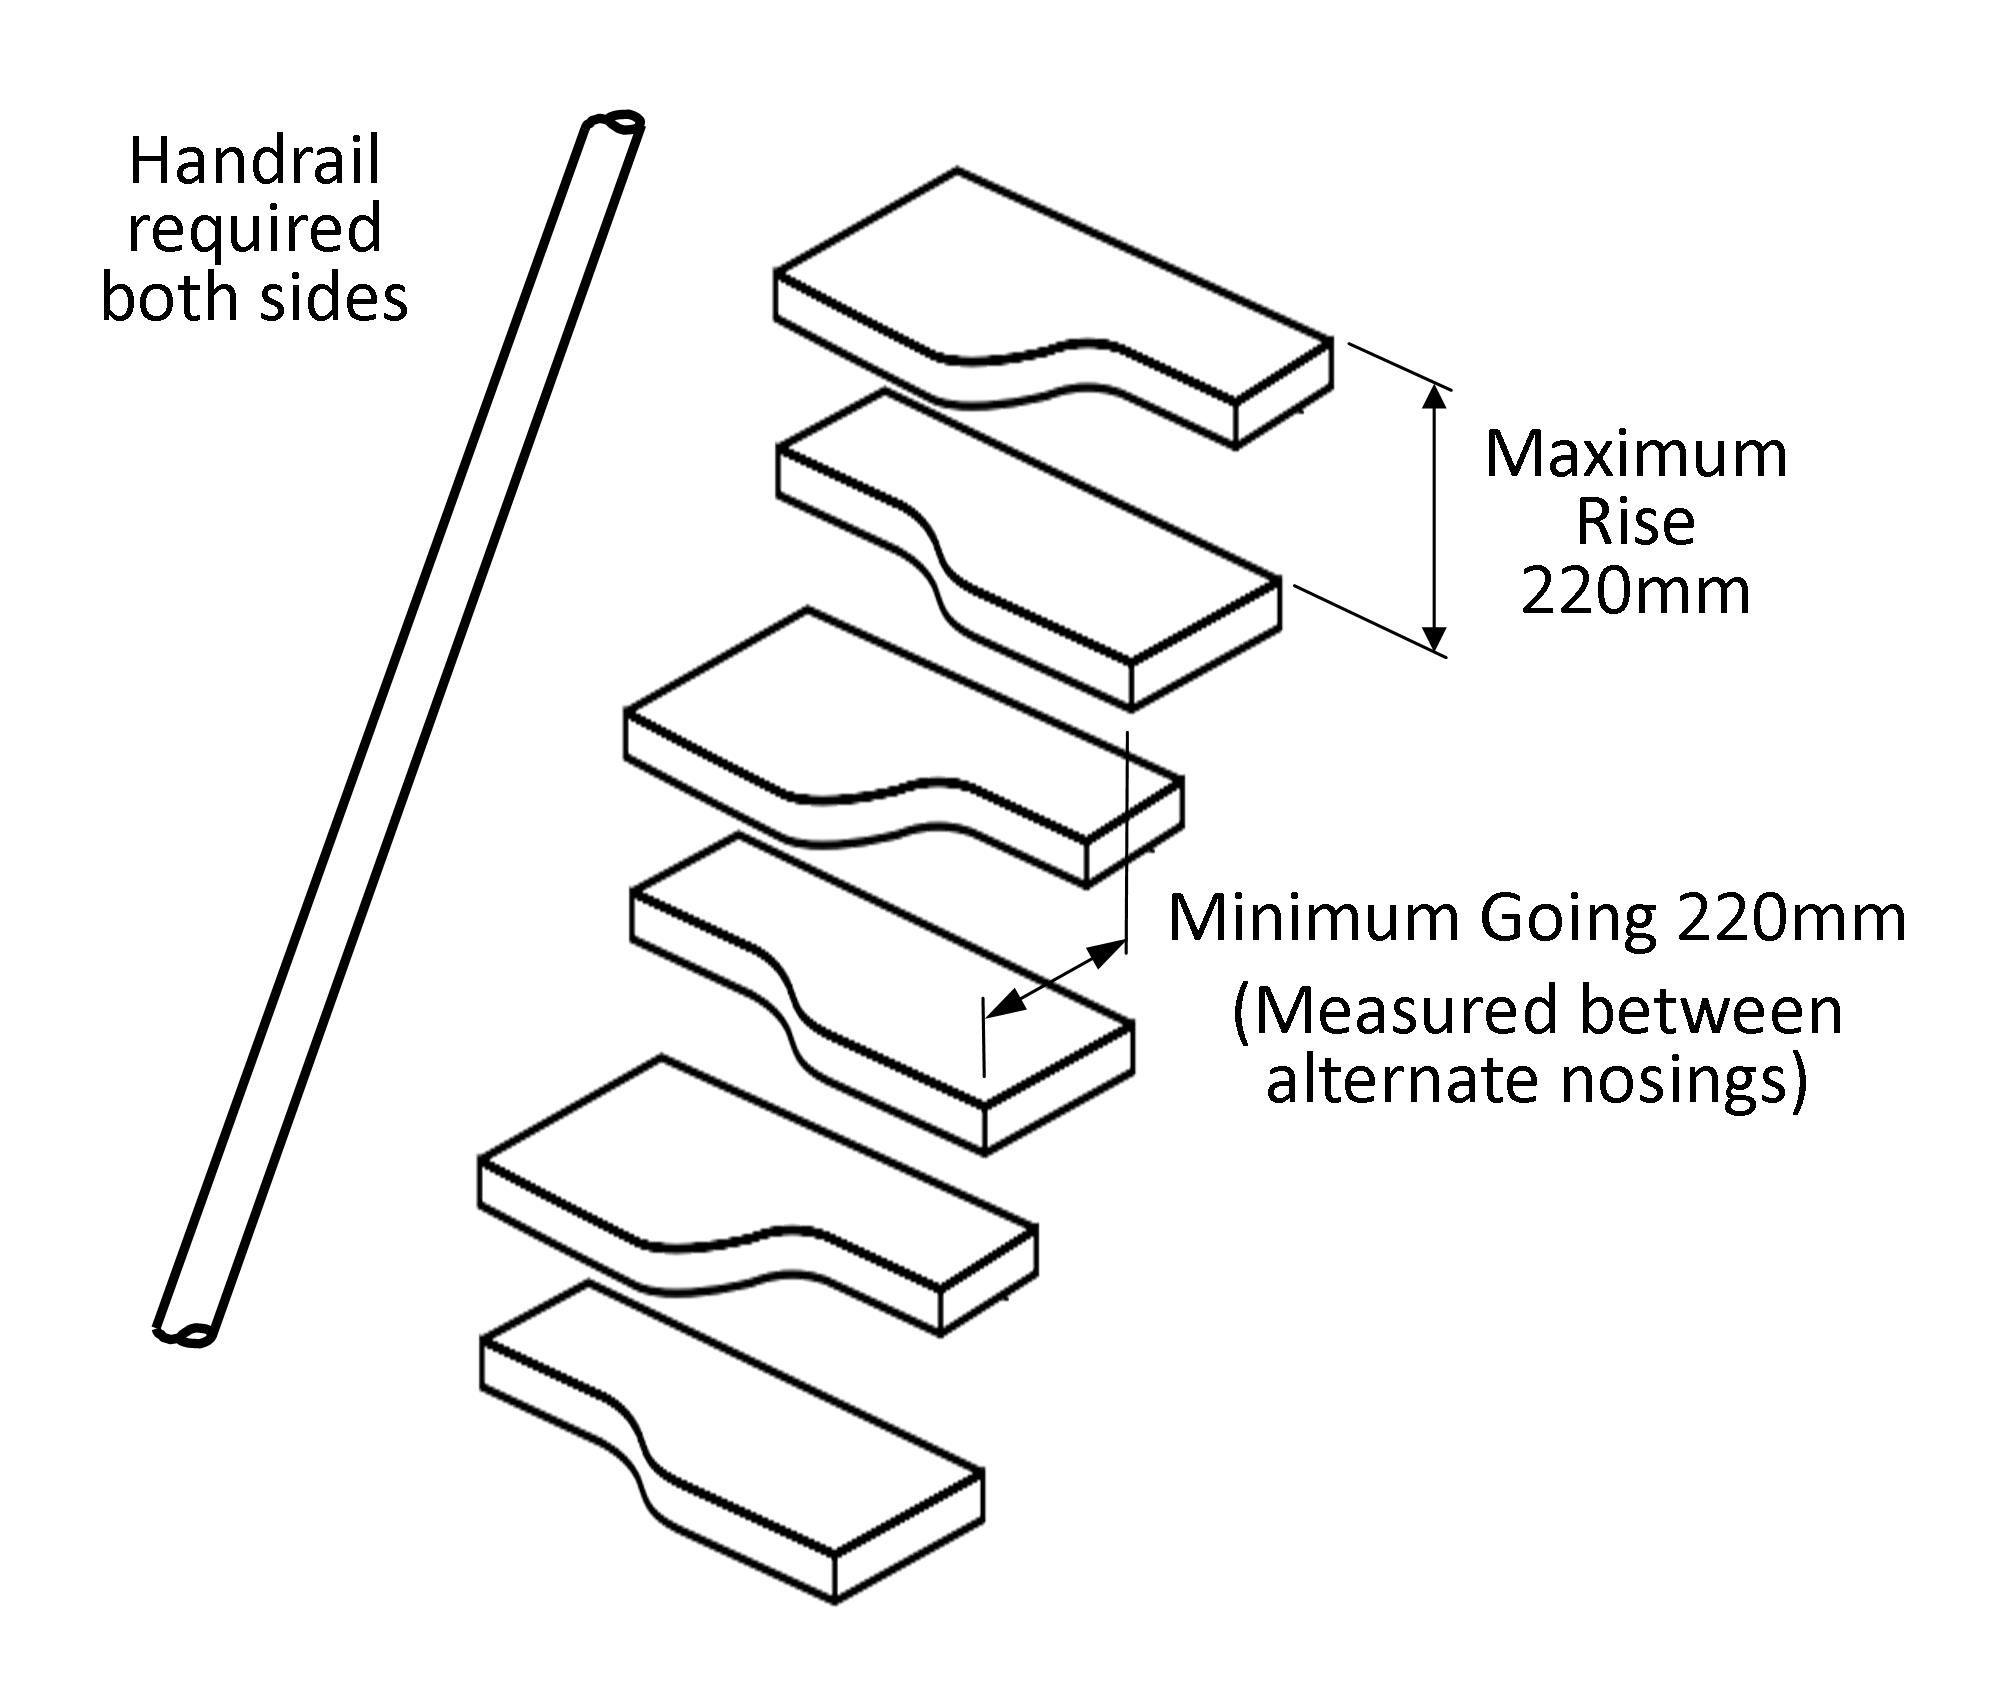 Building Regulations Explained Escaleras Para Casas Pequenas Escaleras Disenos De Unas